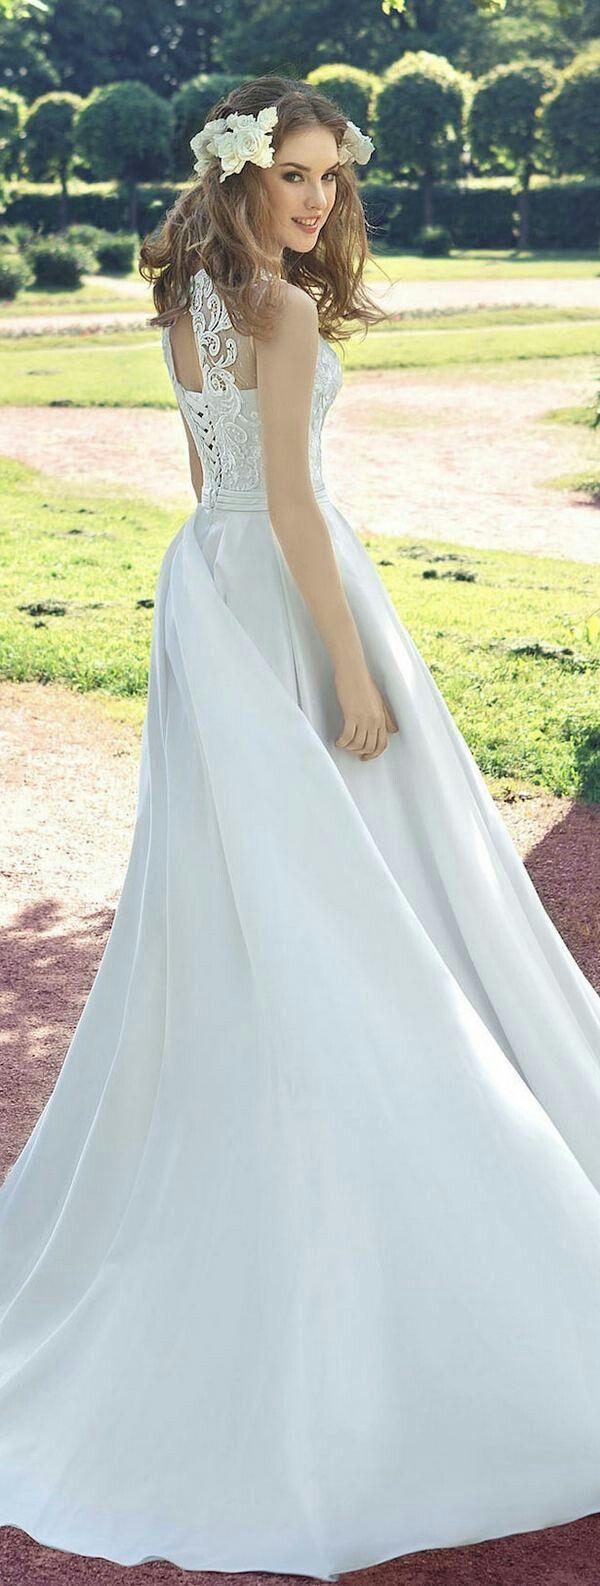 61 best Milva Wedding images on Pinterest | Wedding dressses ...